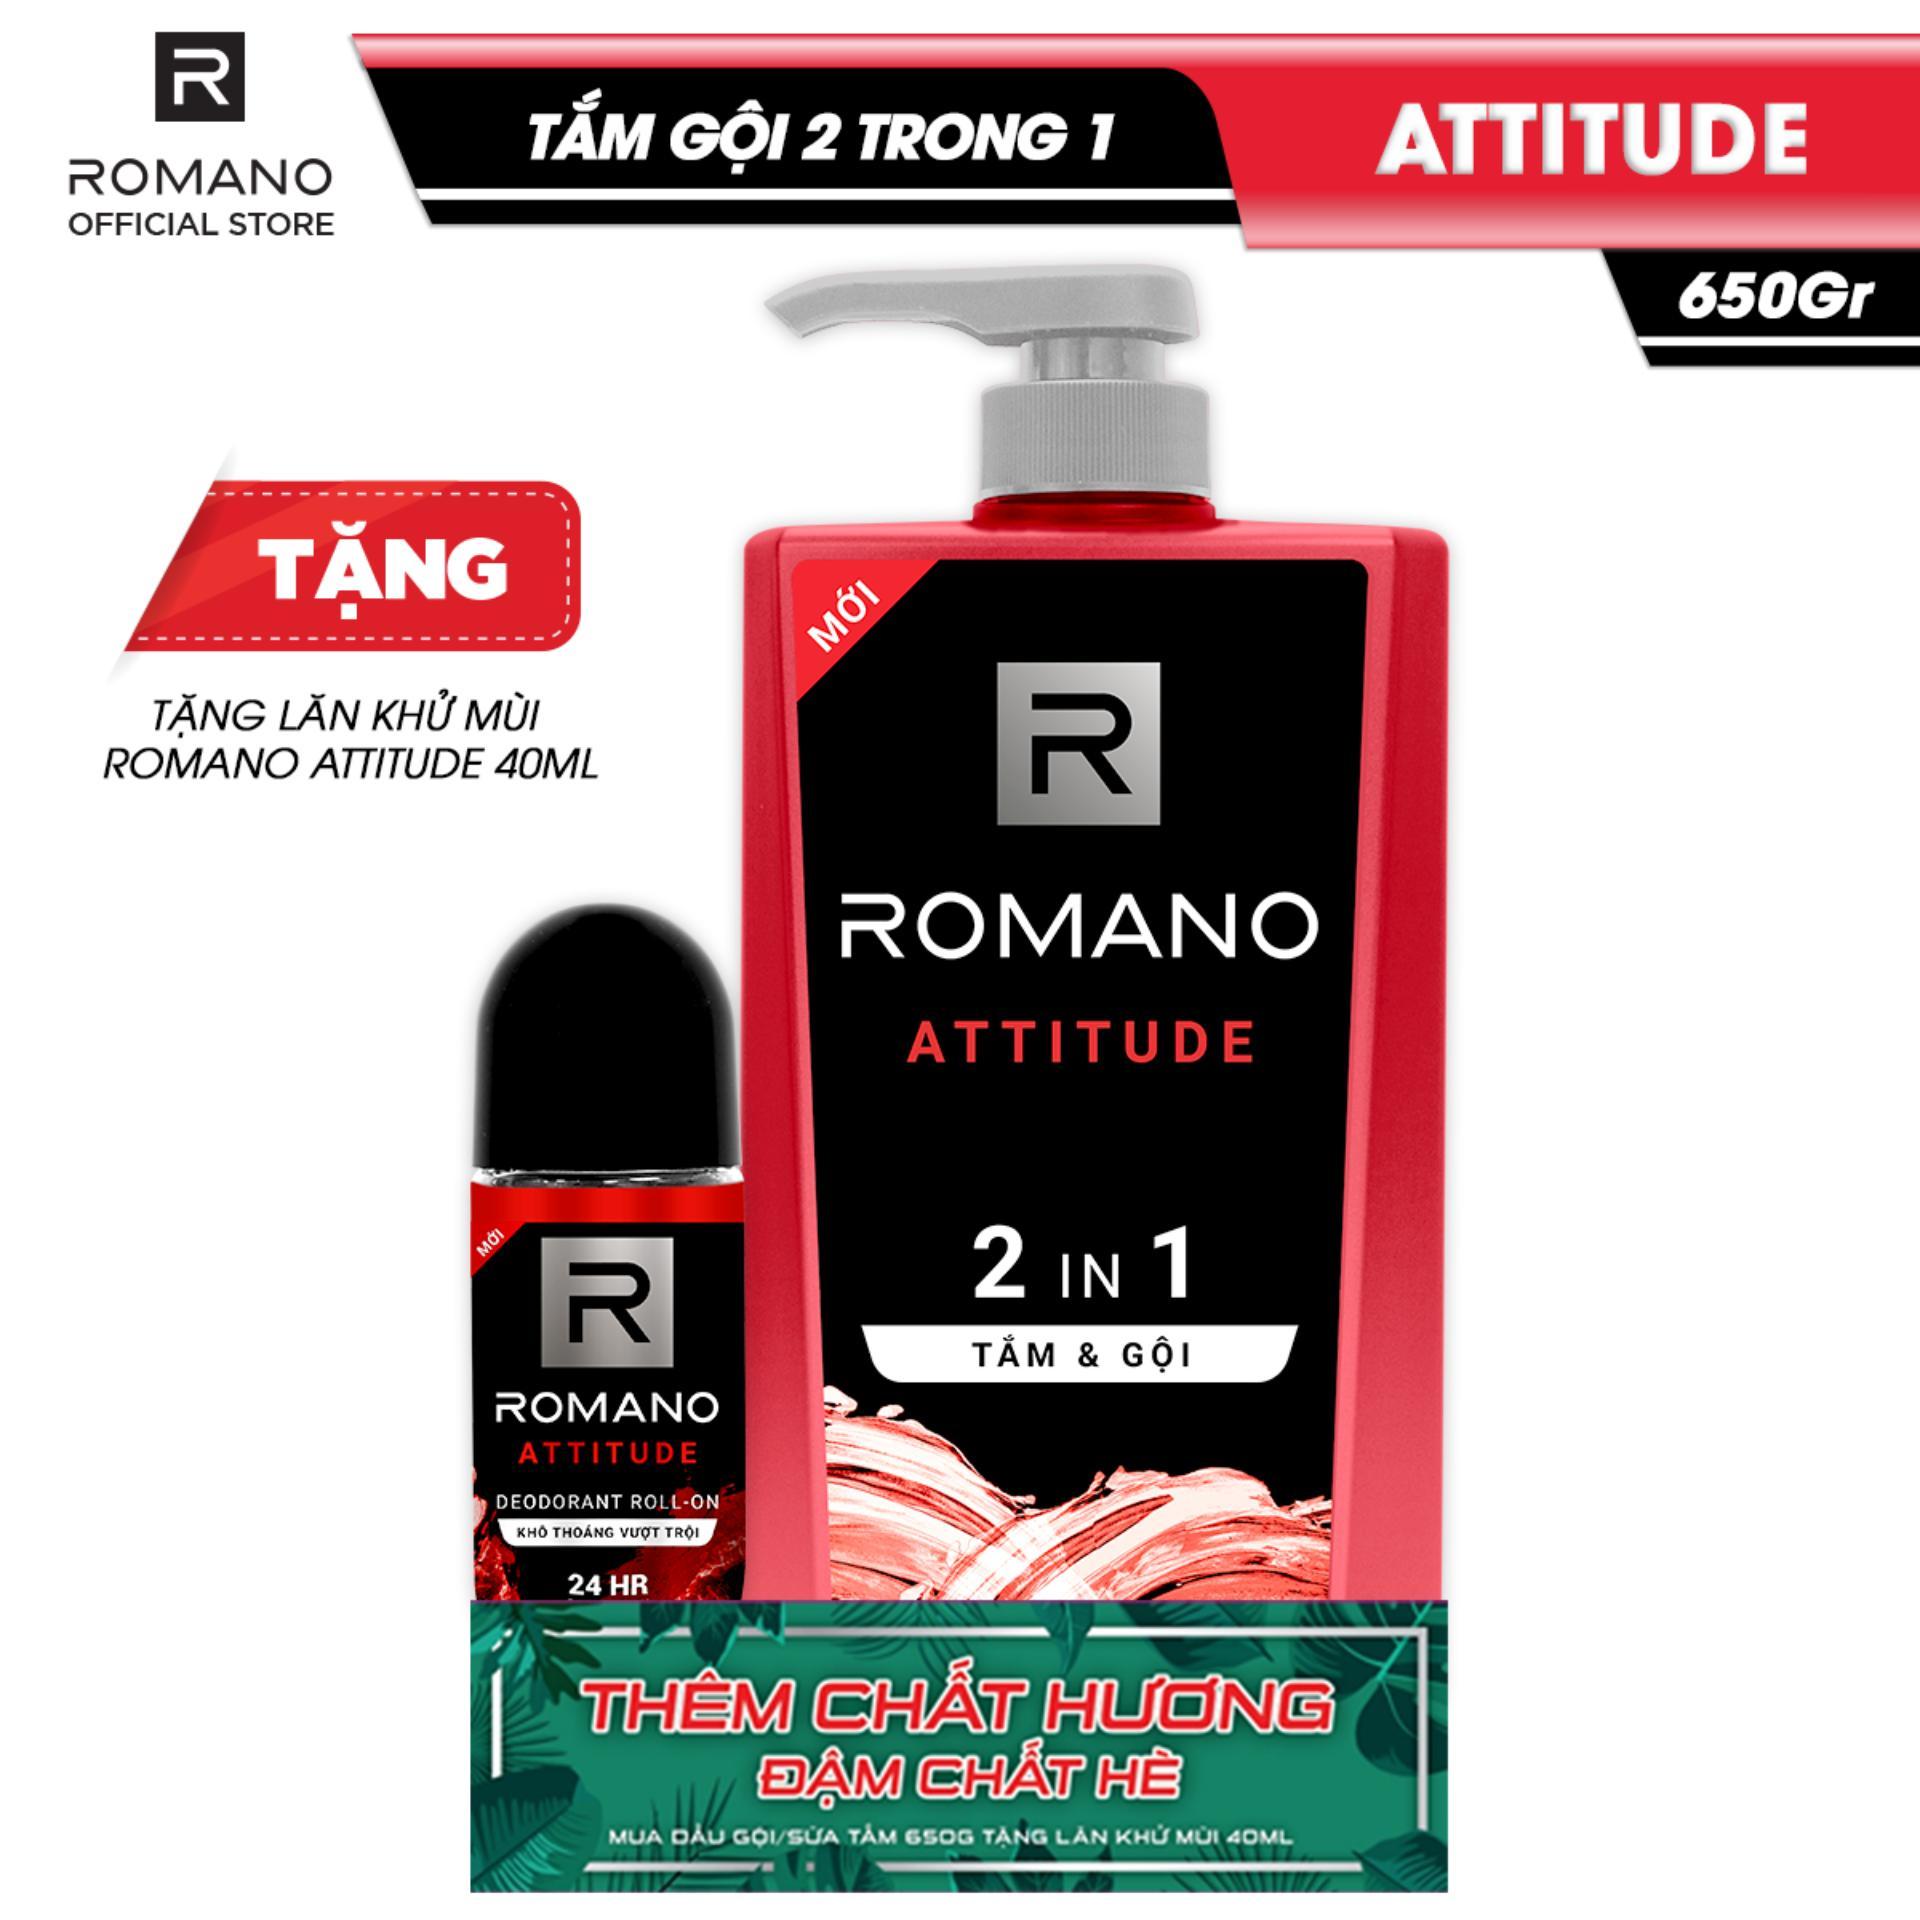 [Tặng Lăn khử mùi Romano Attitude 40ml] Tắm gội 2 trong 1 Romano Attitude 650g